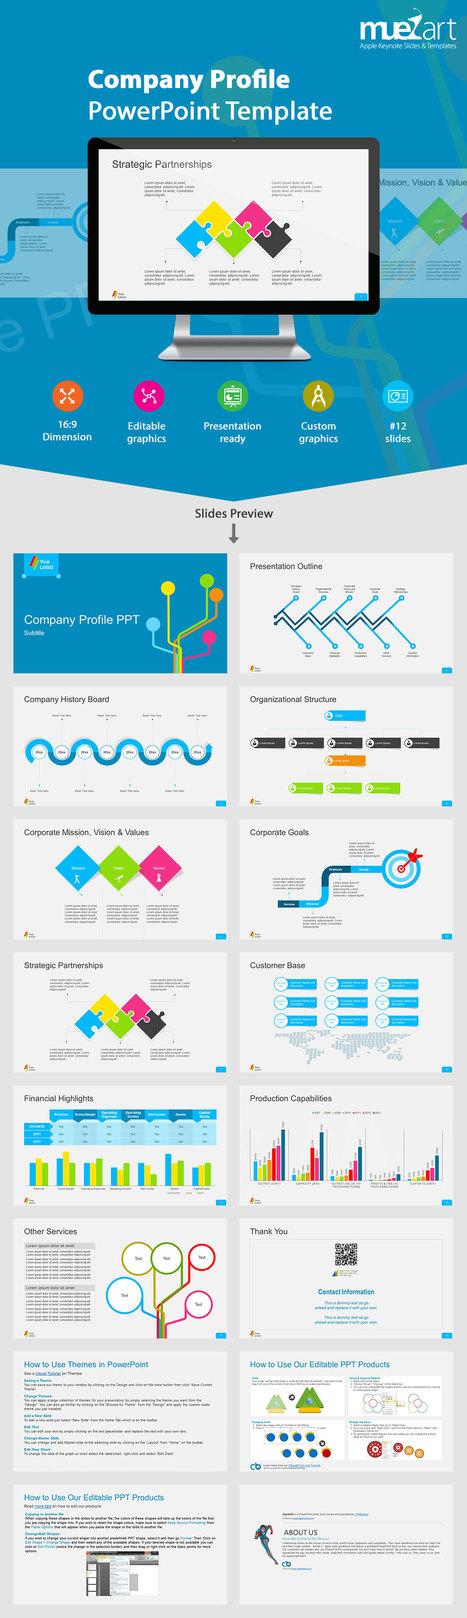 Company Profile Keynote Template | Apple Keynote Slides For Sale | Scoop.it